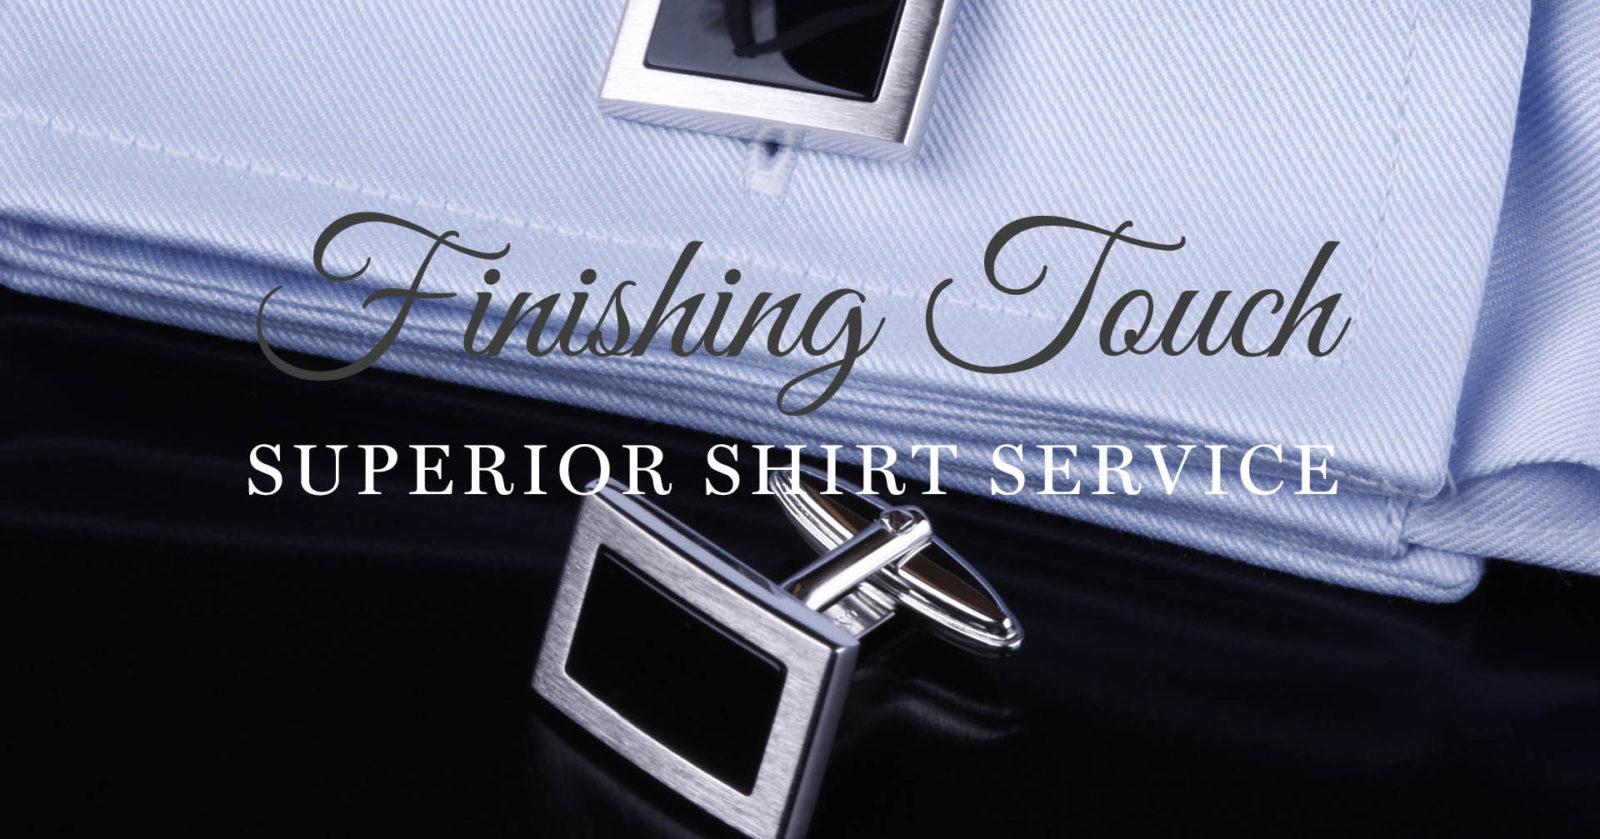 Superior Shirt Service